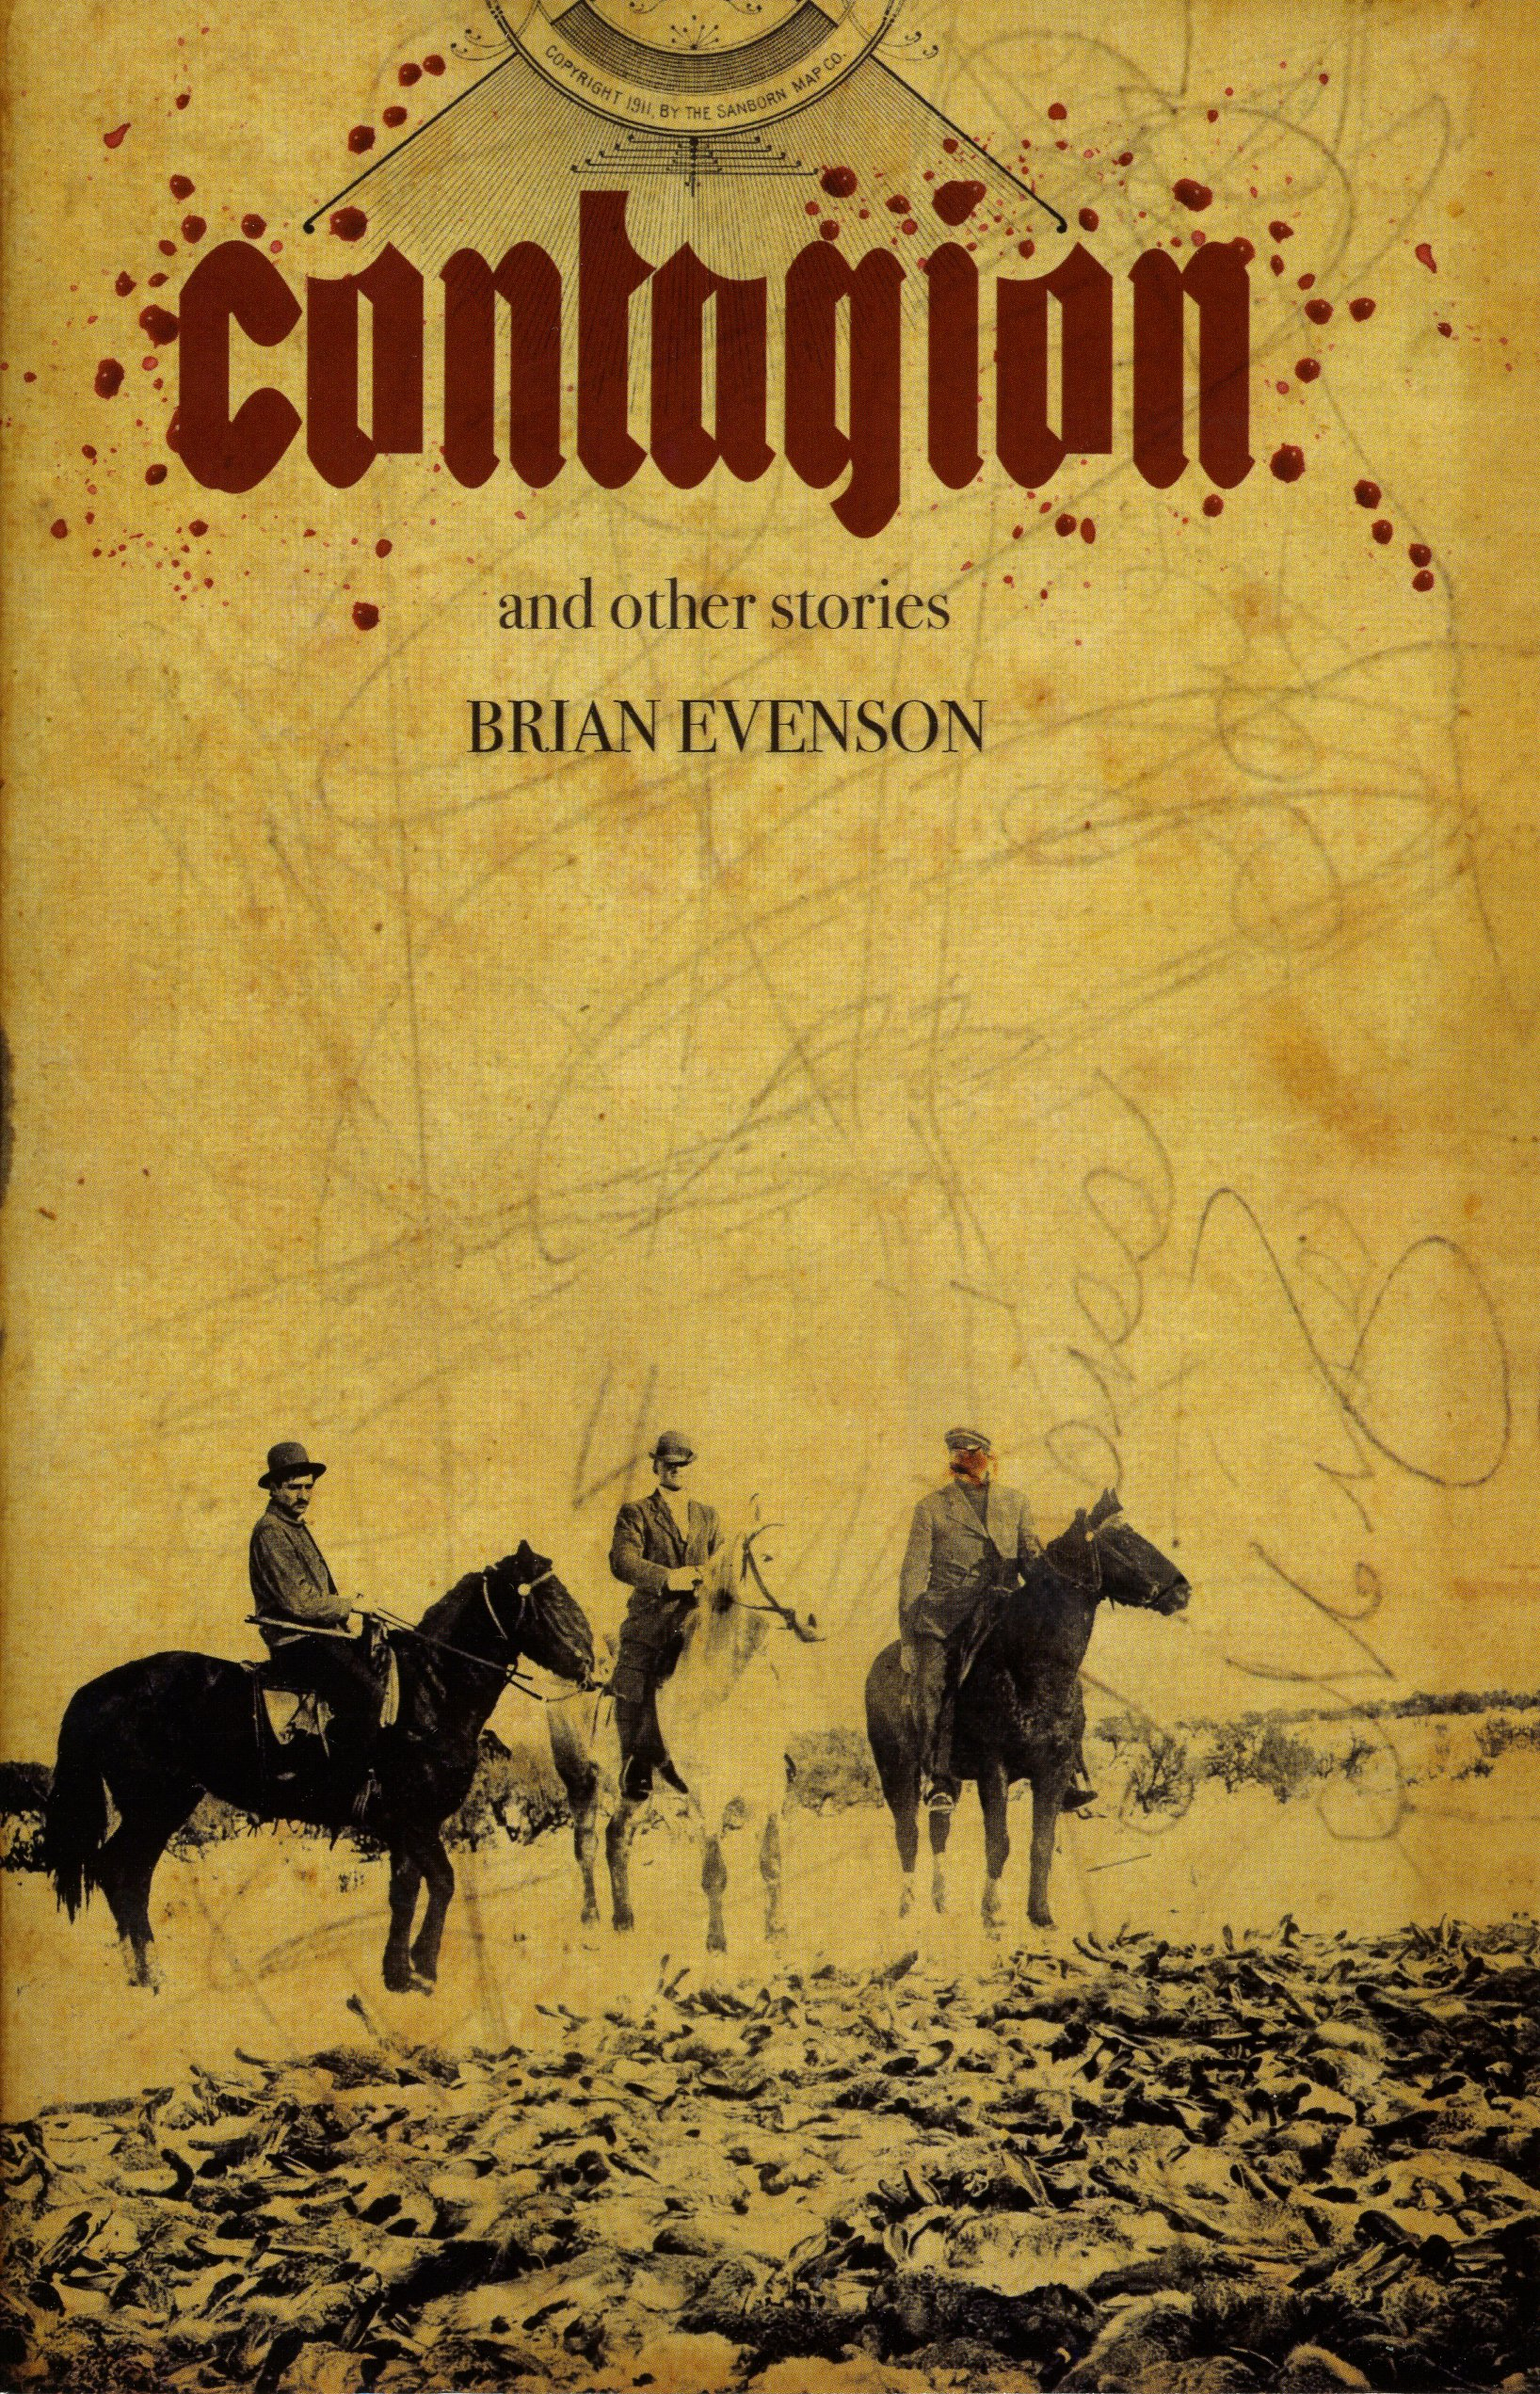 AP 5 CONTAGION by Brian Evenson